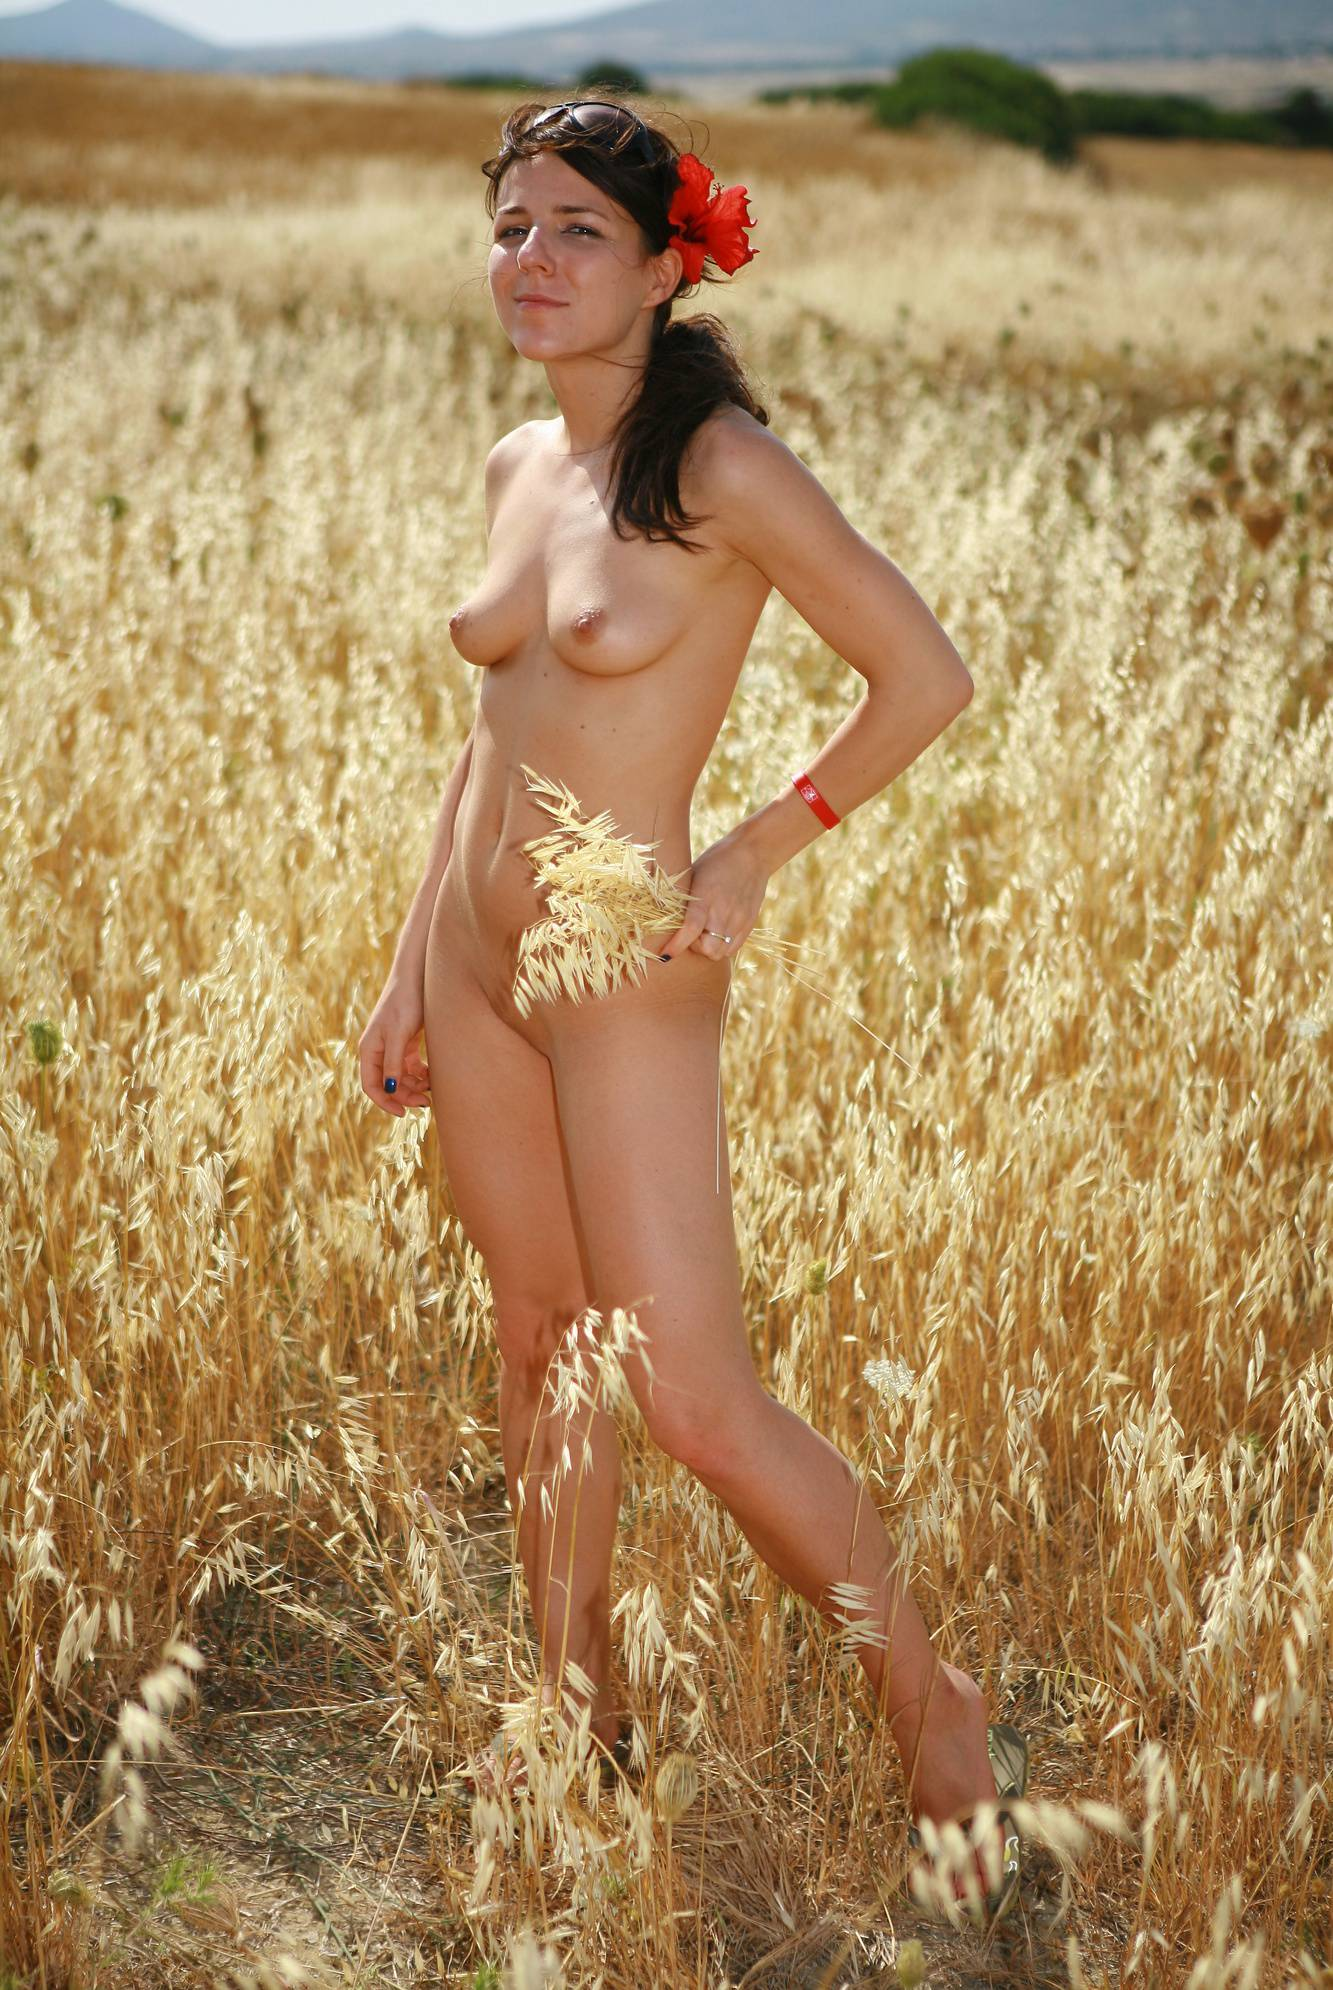 Nudist Photos Greek Barley Wheat Fields - 2